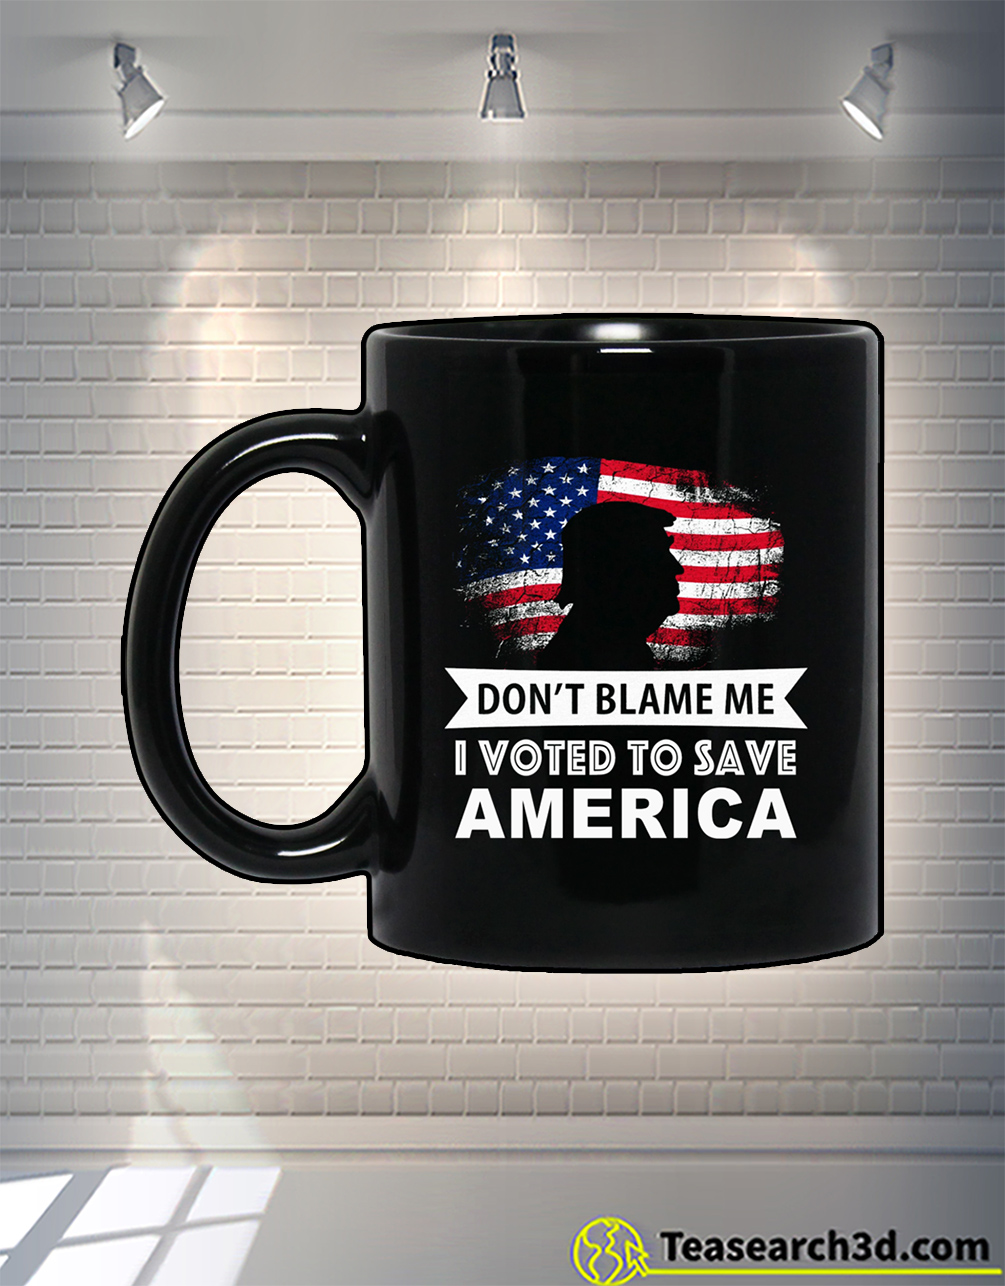 Don't blame me I voted to save america mug